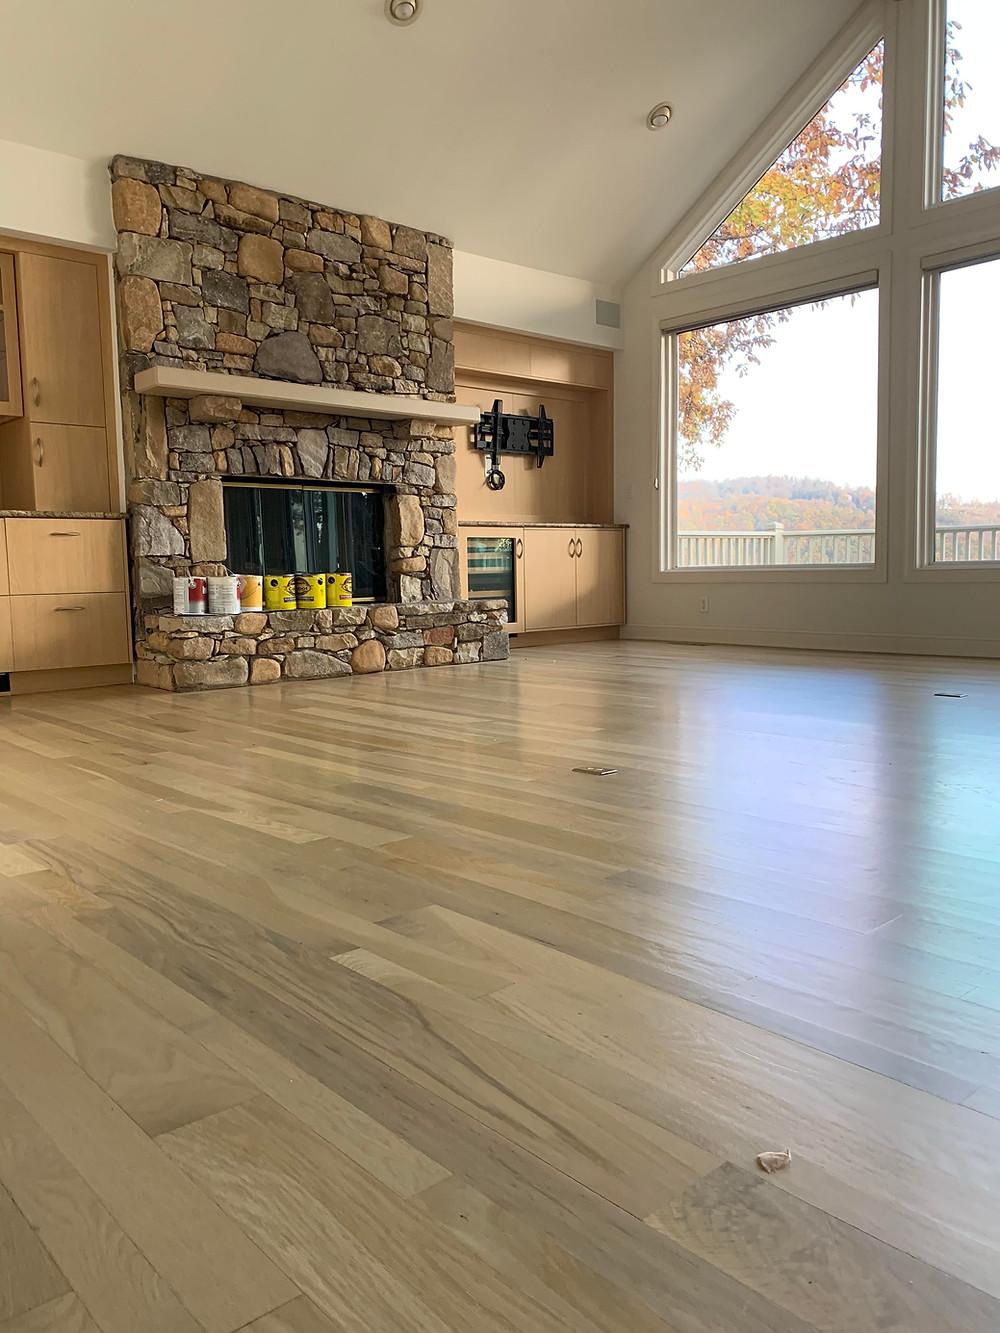 Proper floor care